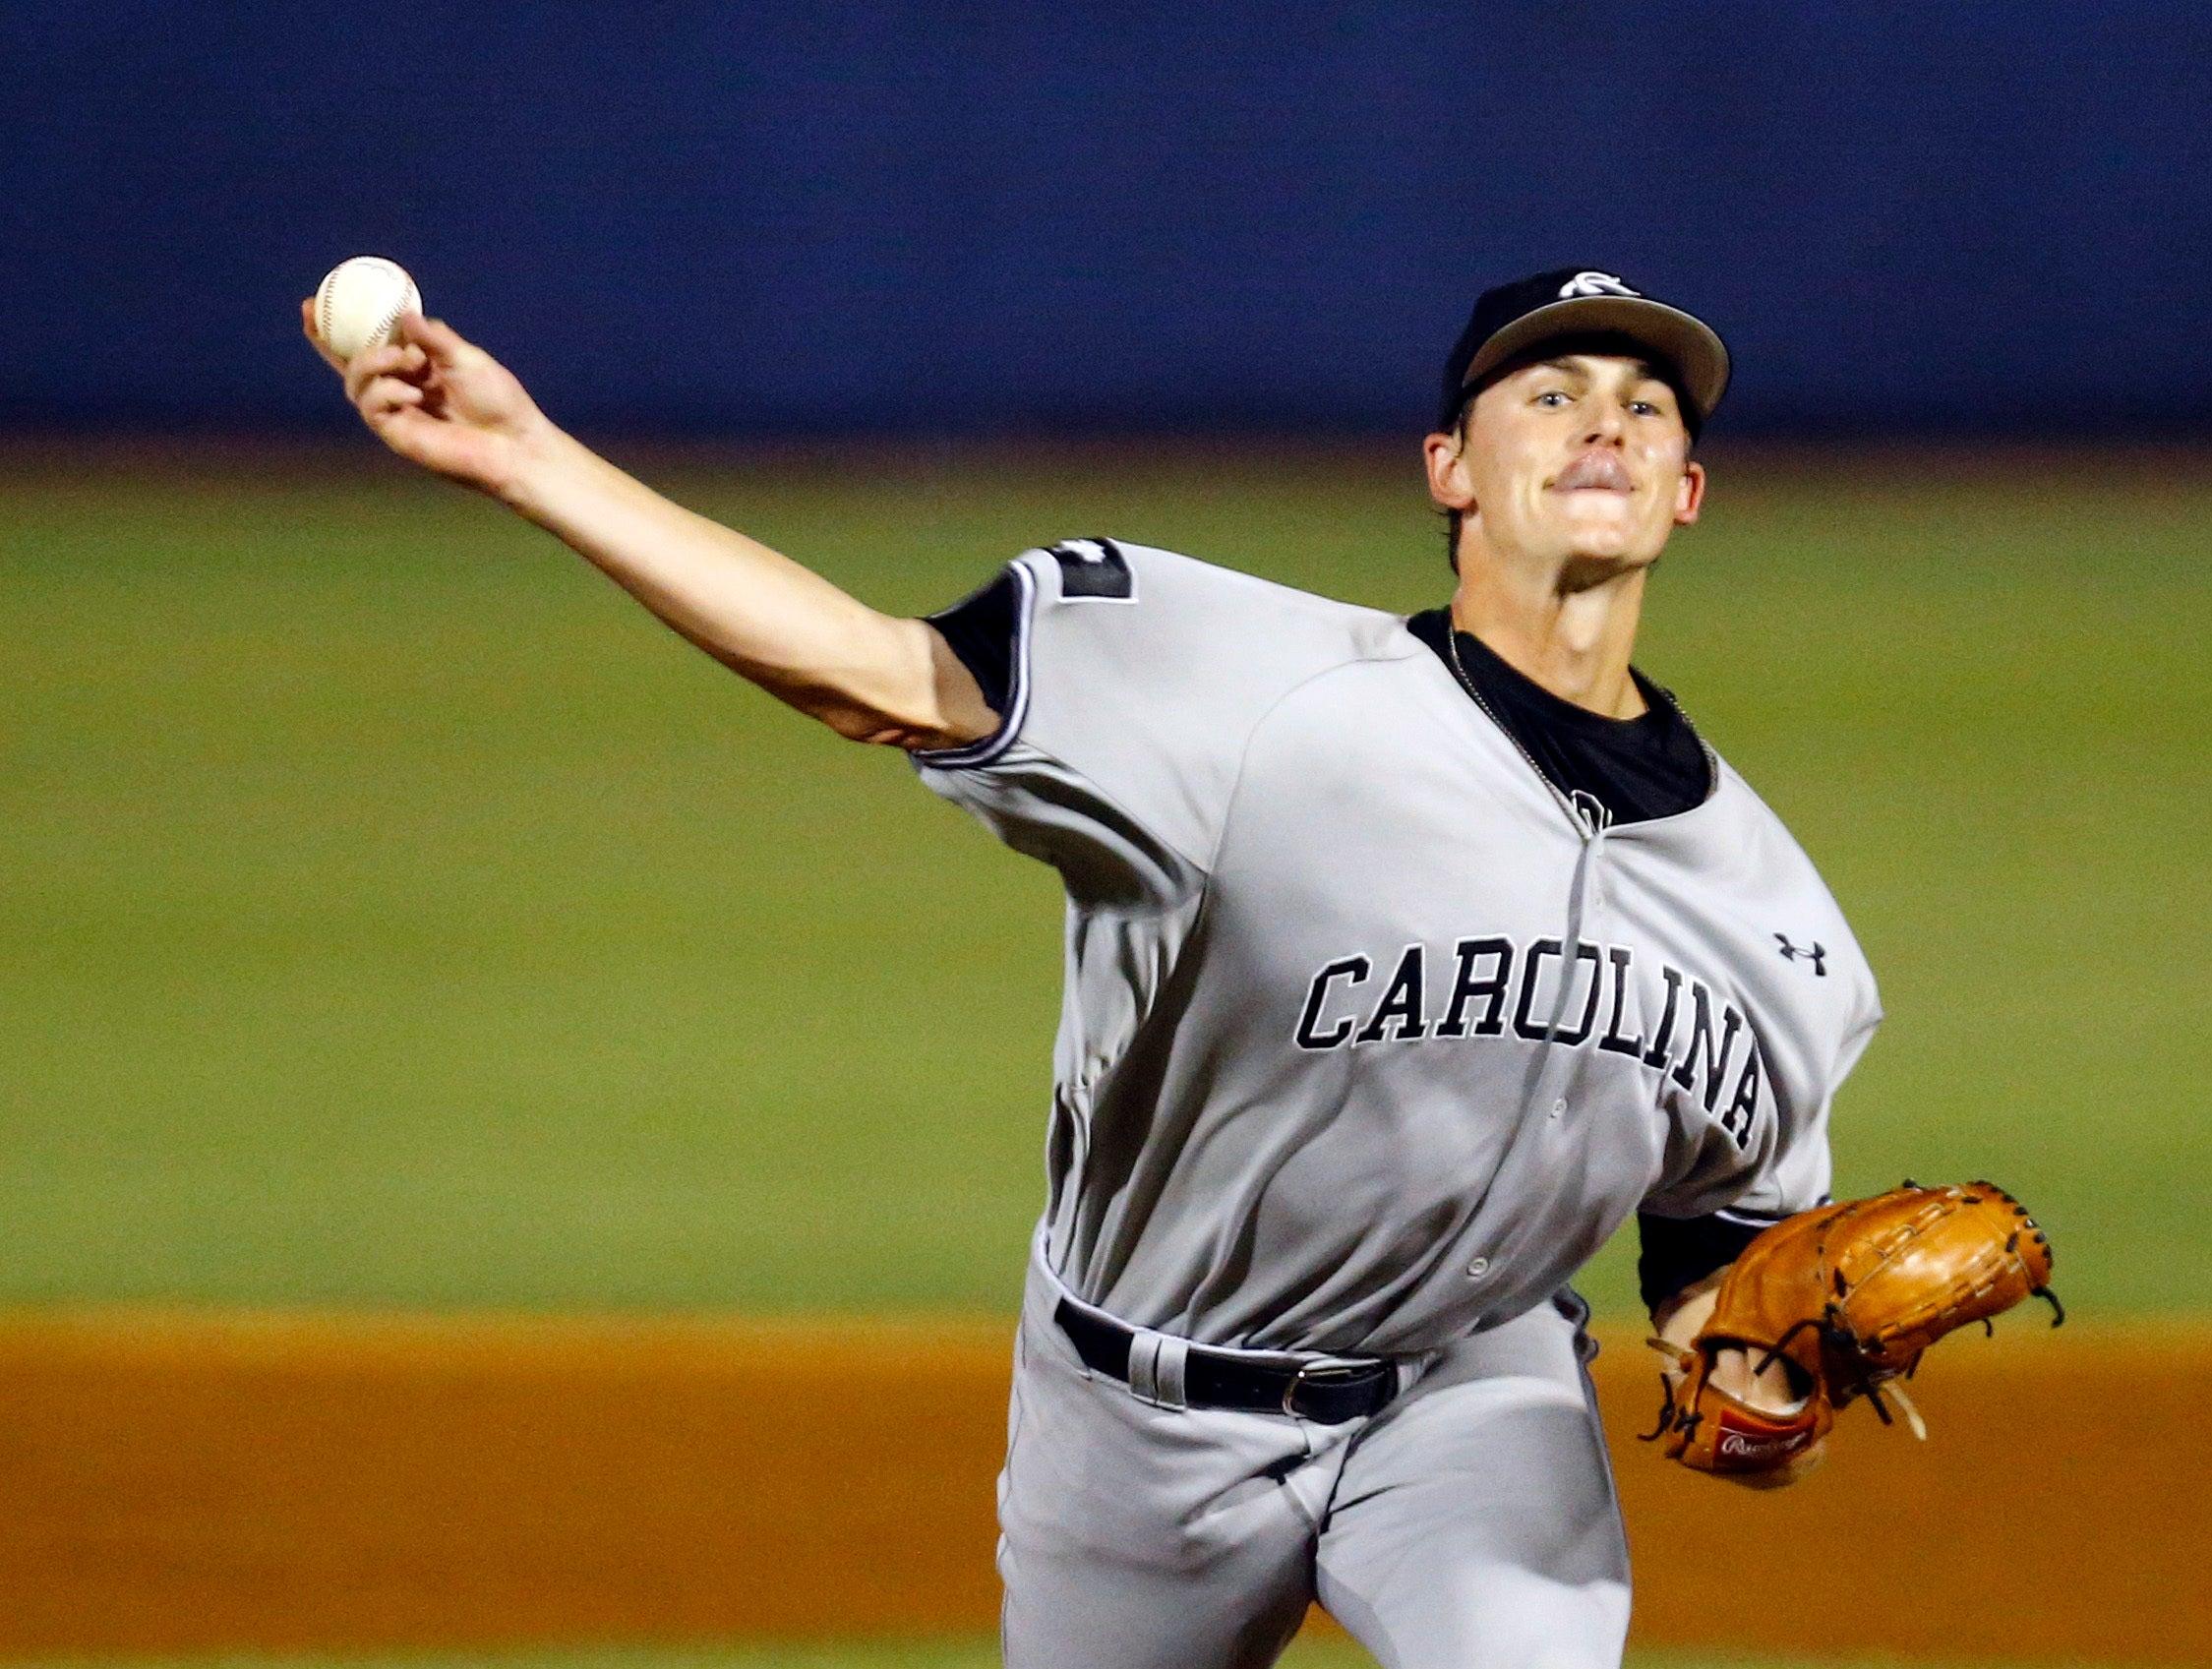 LSU rallies to beat South Carolina 8-6 in SEC Tournament